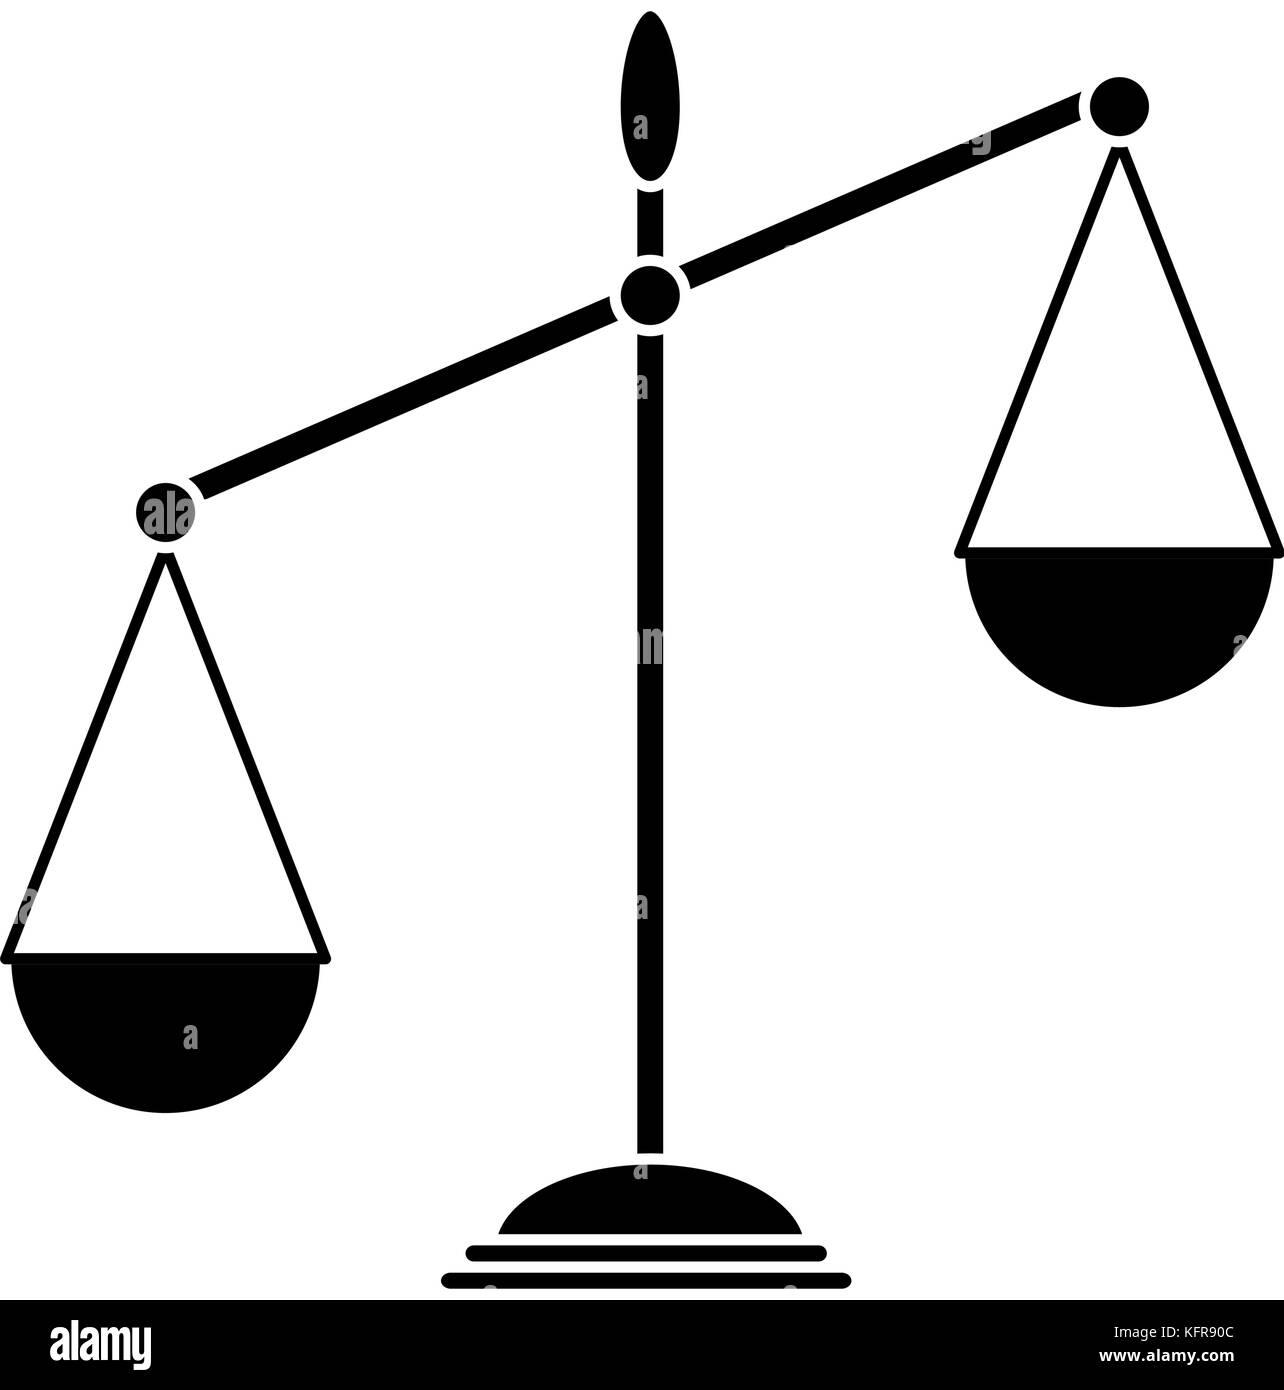 Balance scale stock photos balance scale stock images alamy balance scale isolated icon stock image biocorpaavc Images